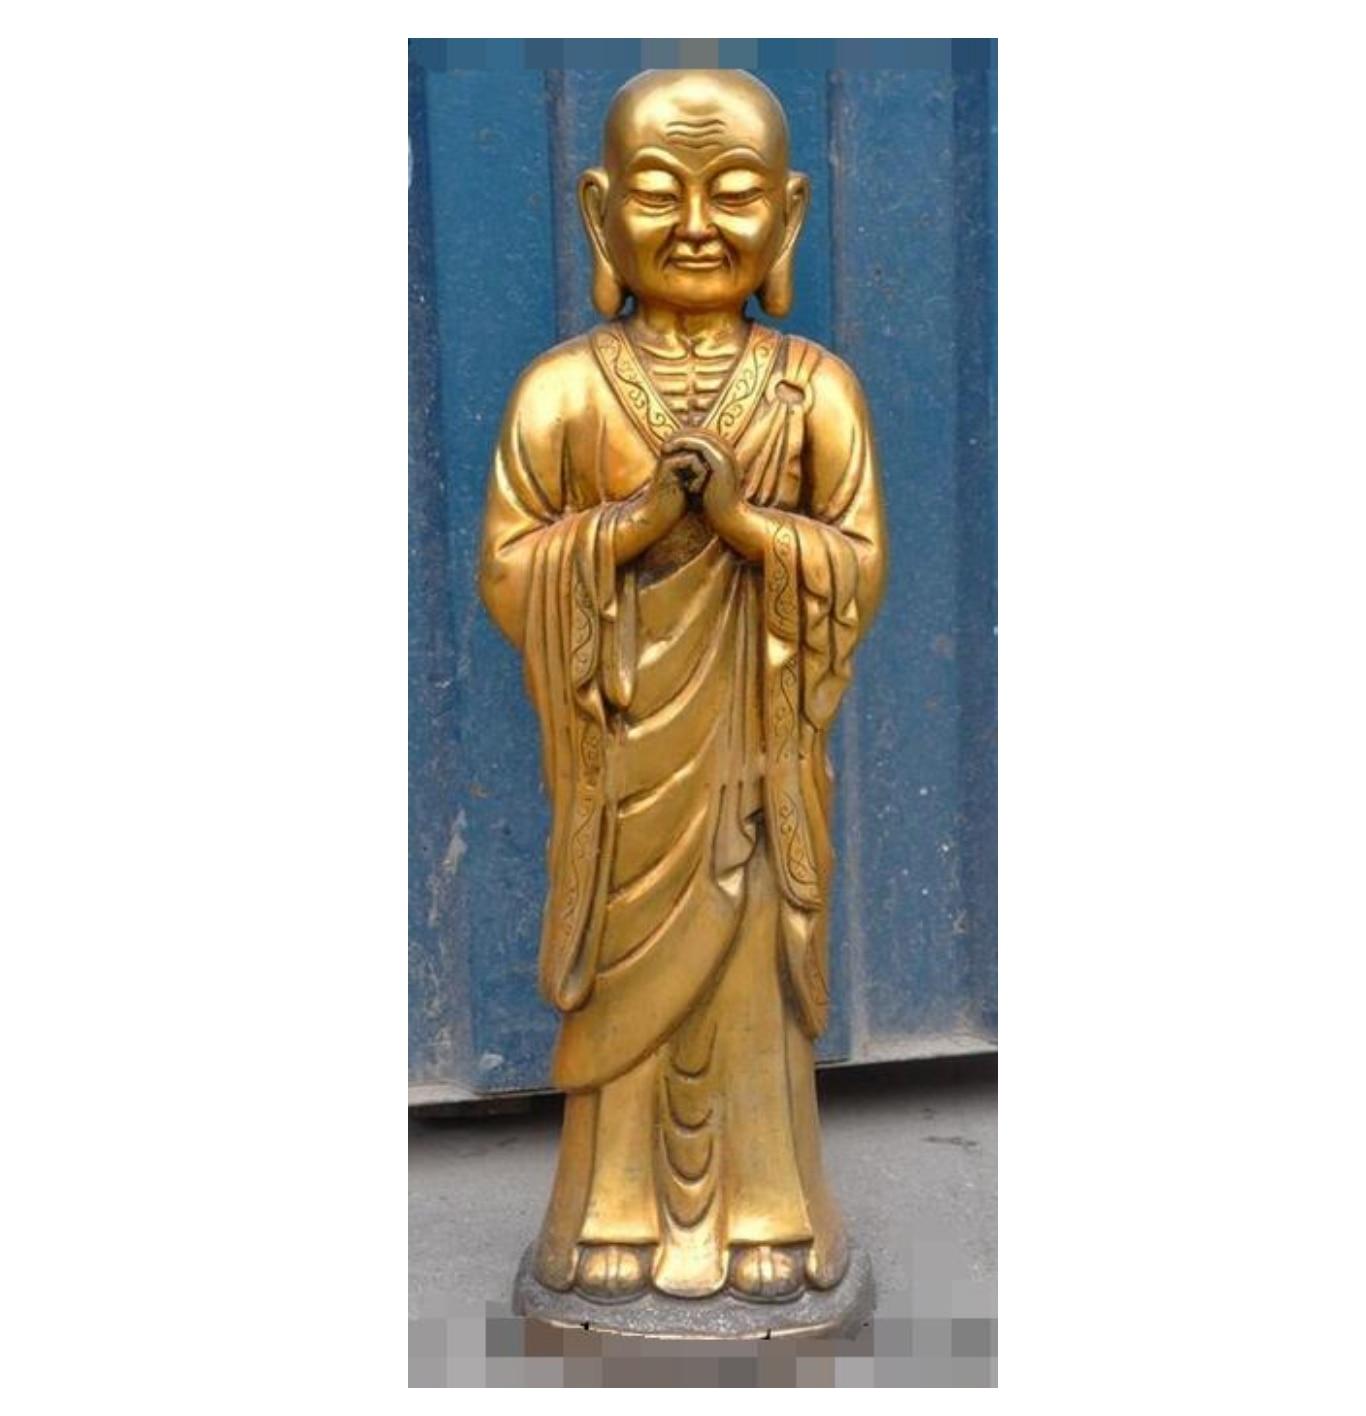 Tibet, Budismo de bronce dorado Tantra Anan Tuo eminentes estatua del monje Buda escultura